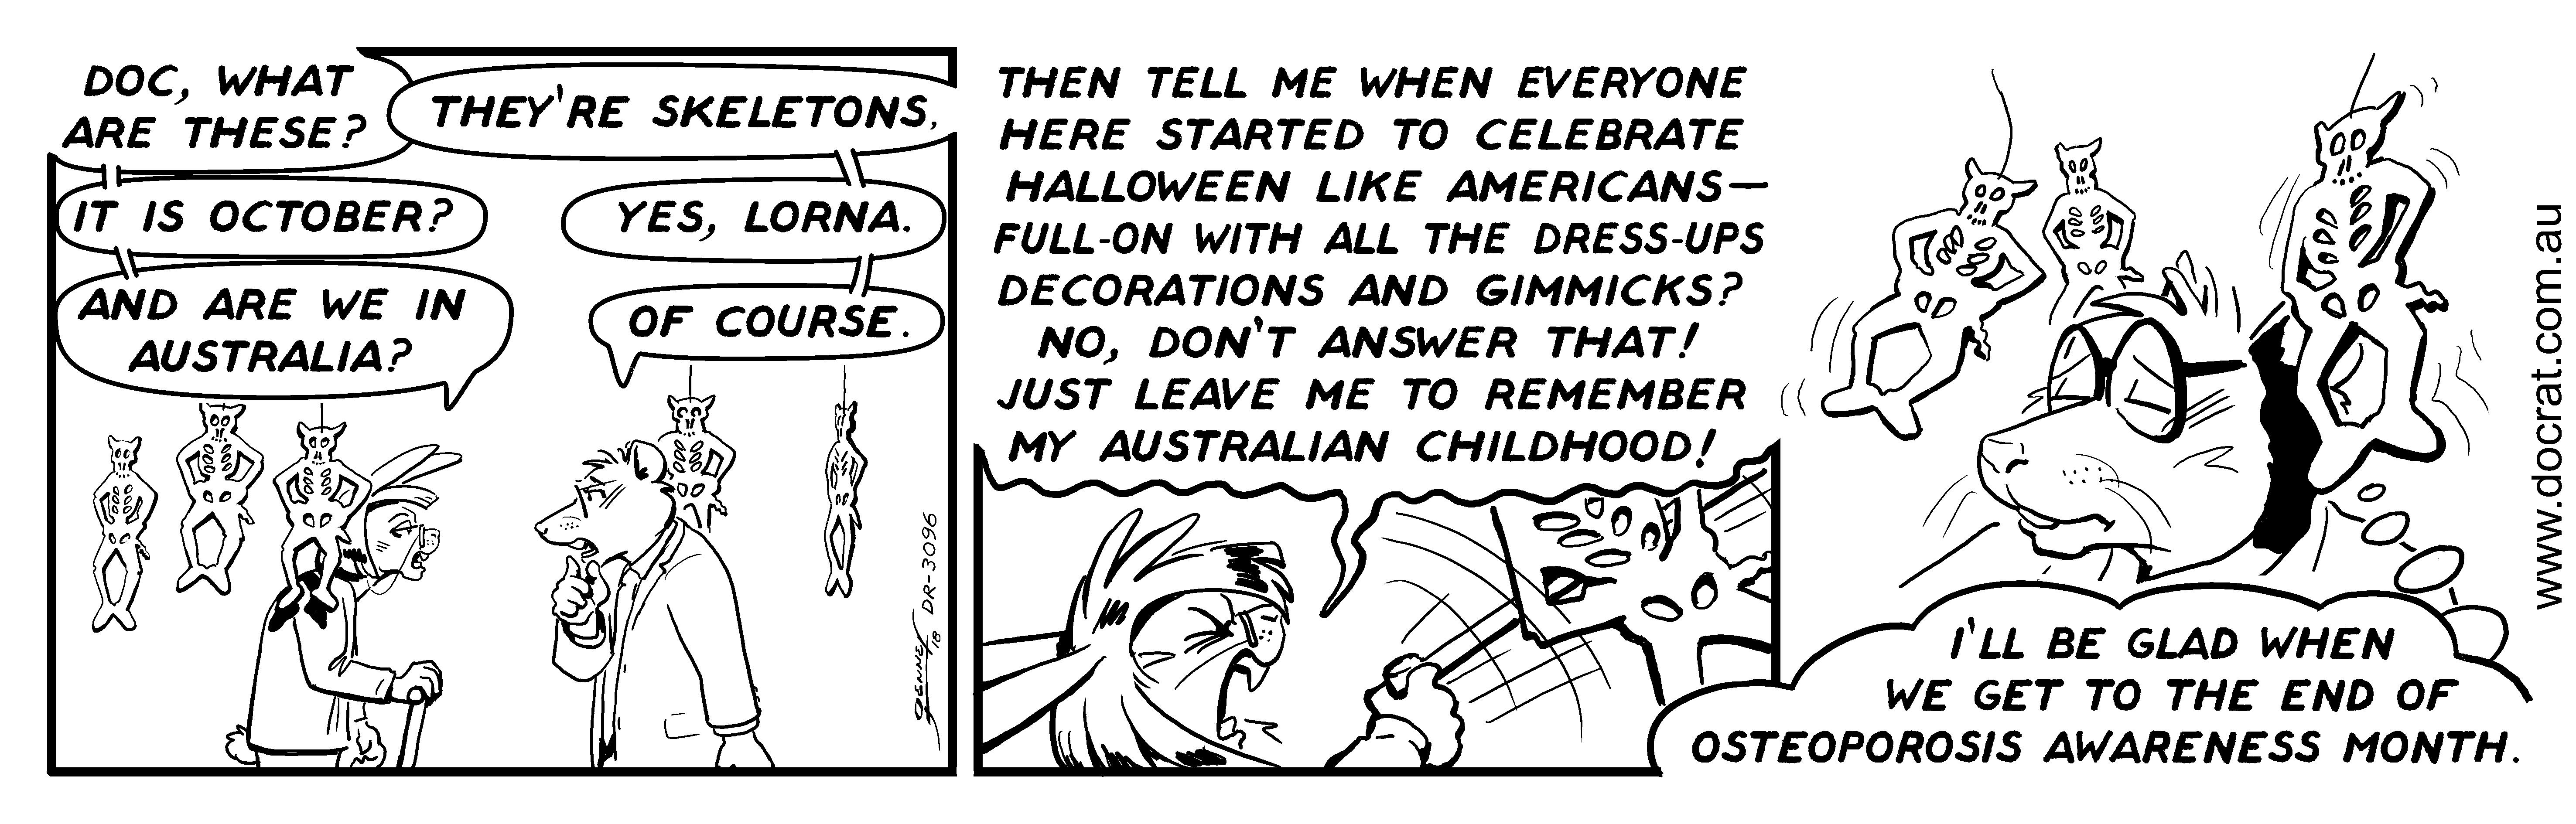 20181022